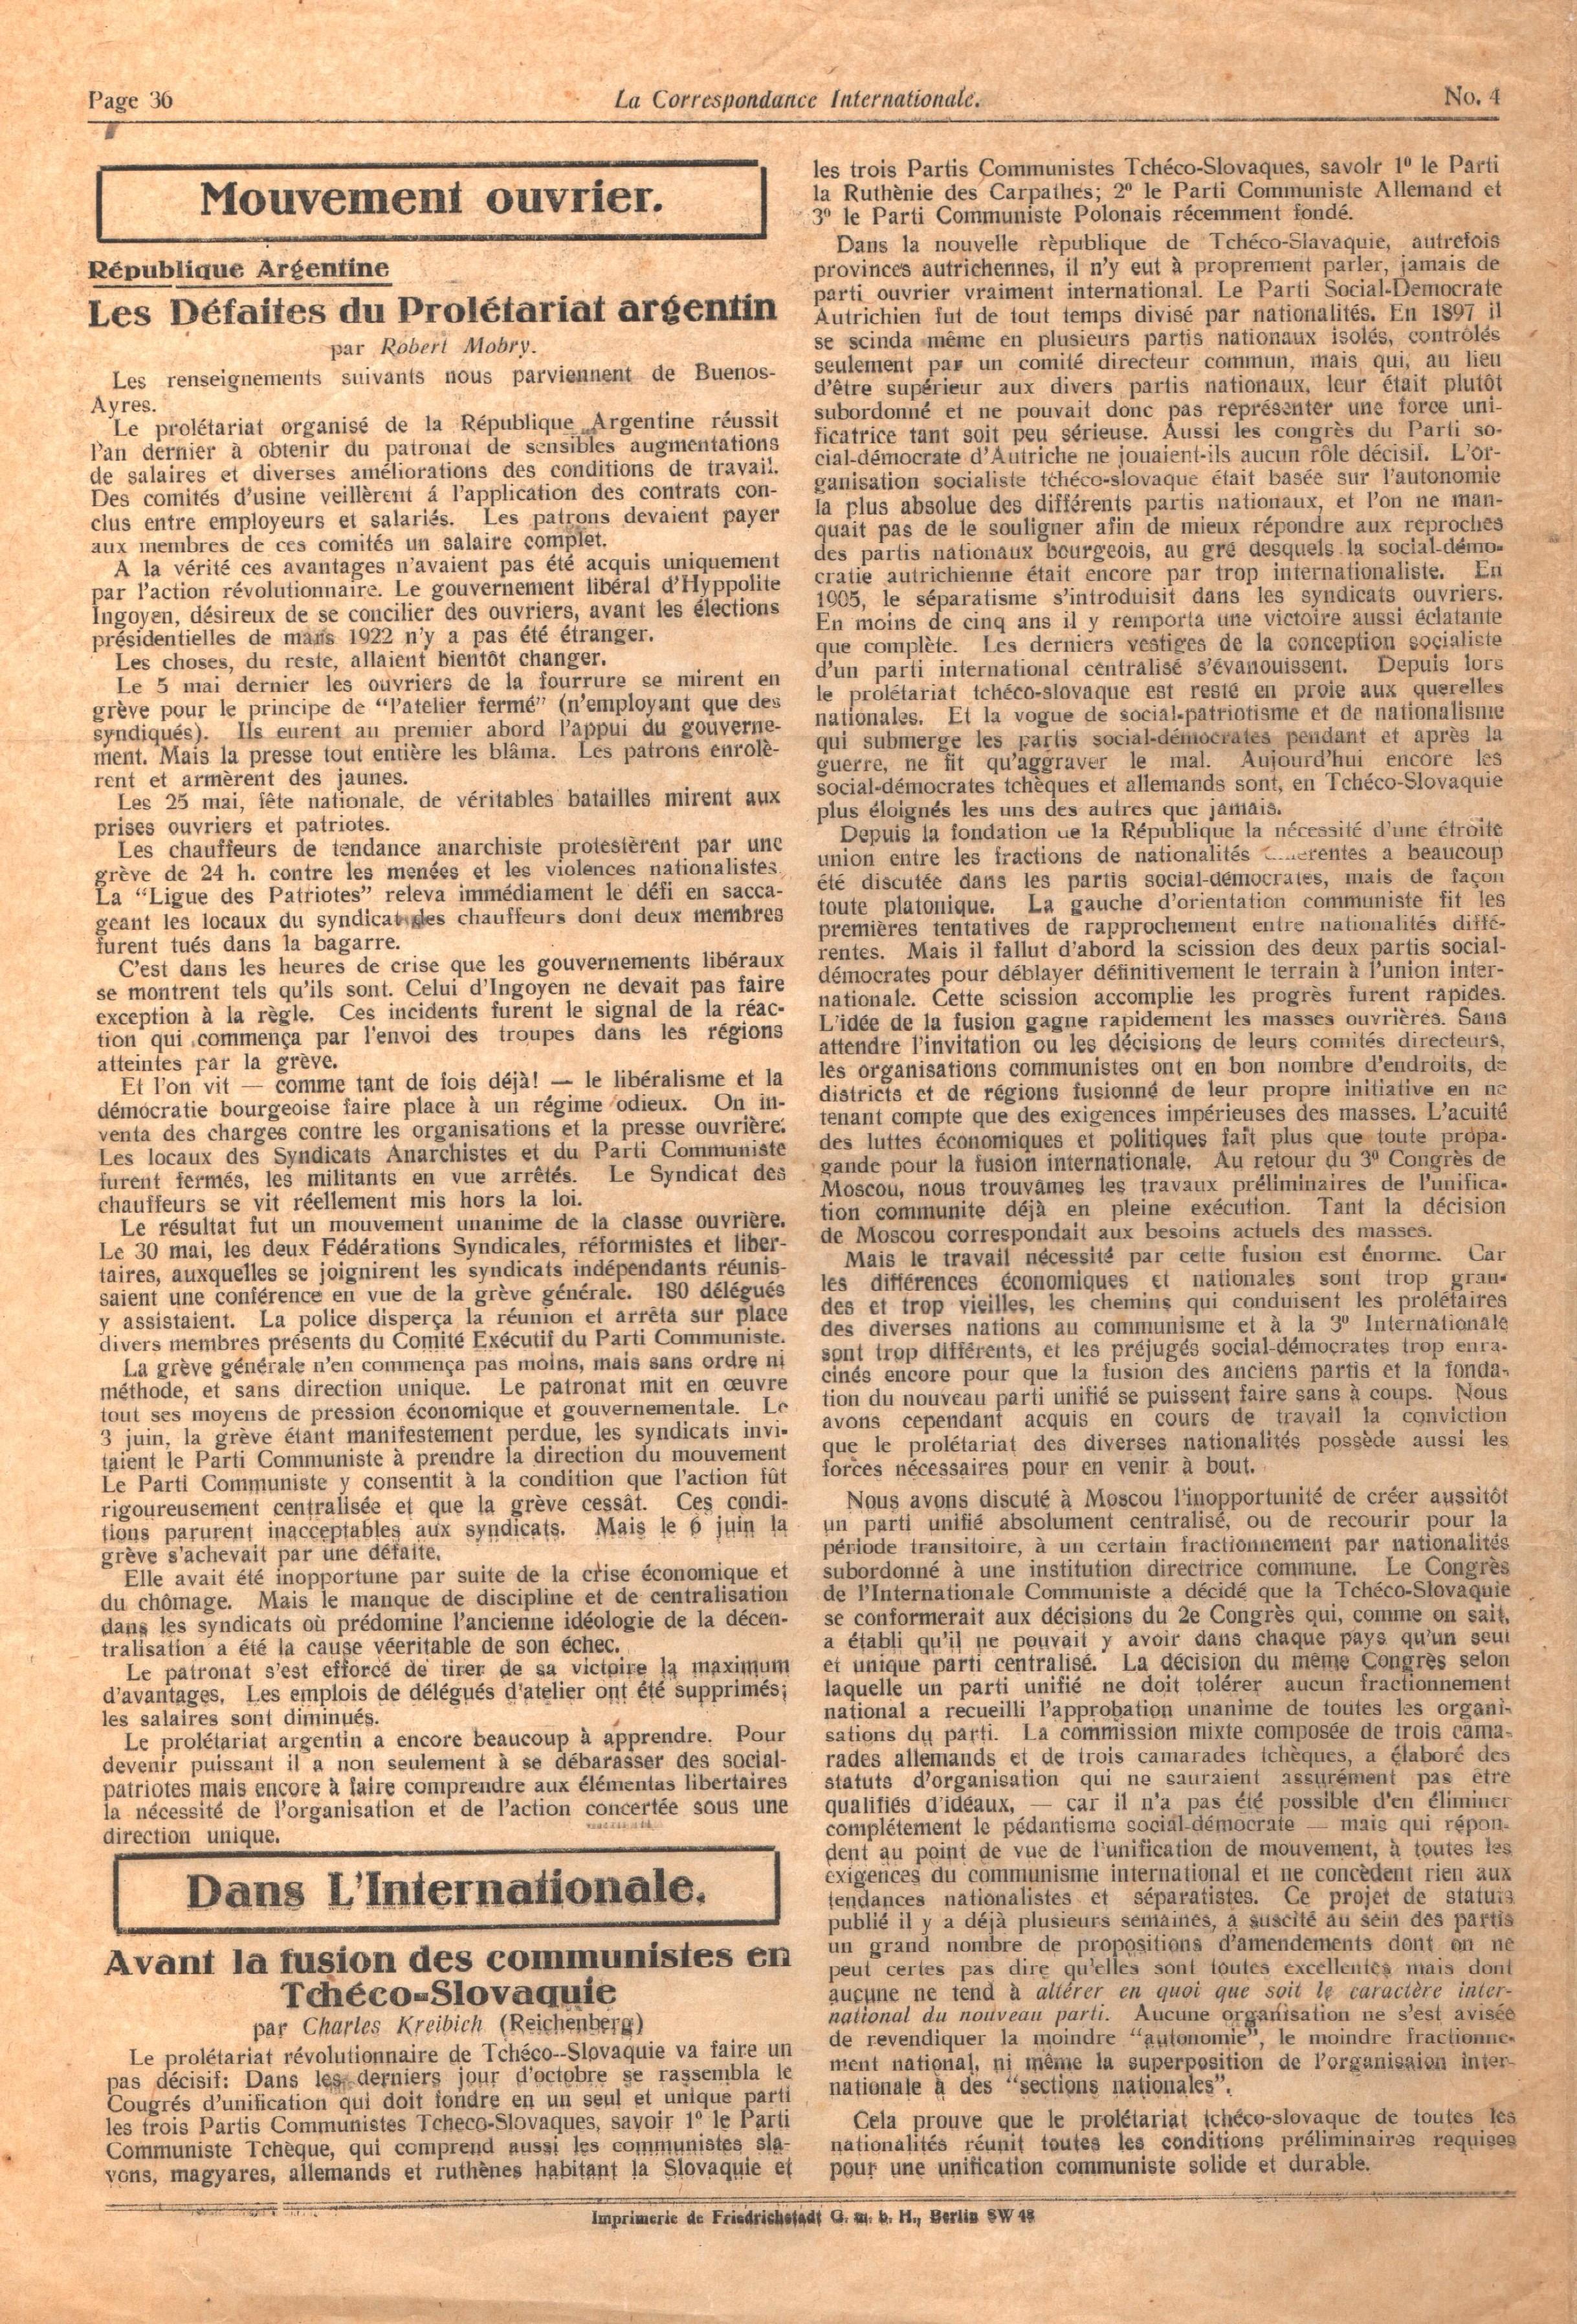 Correspondance Internationale n. 4 - pag. 8